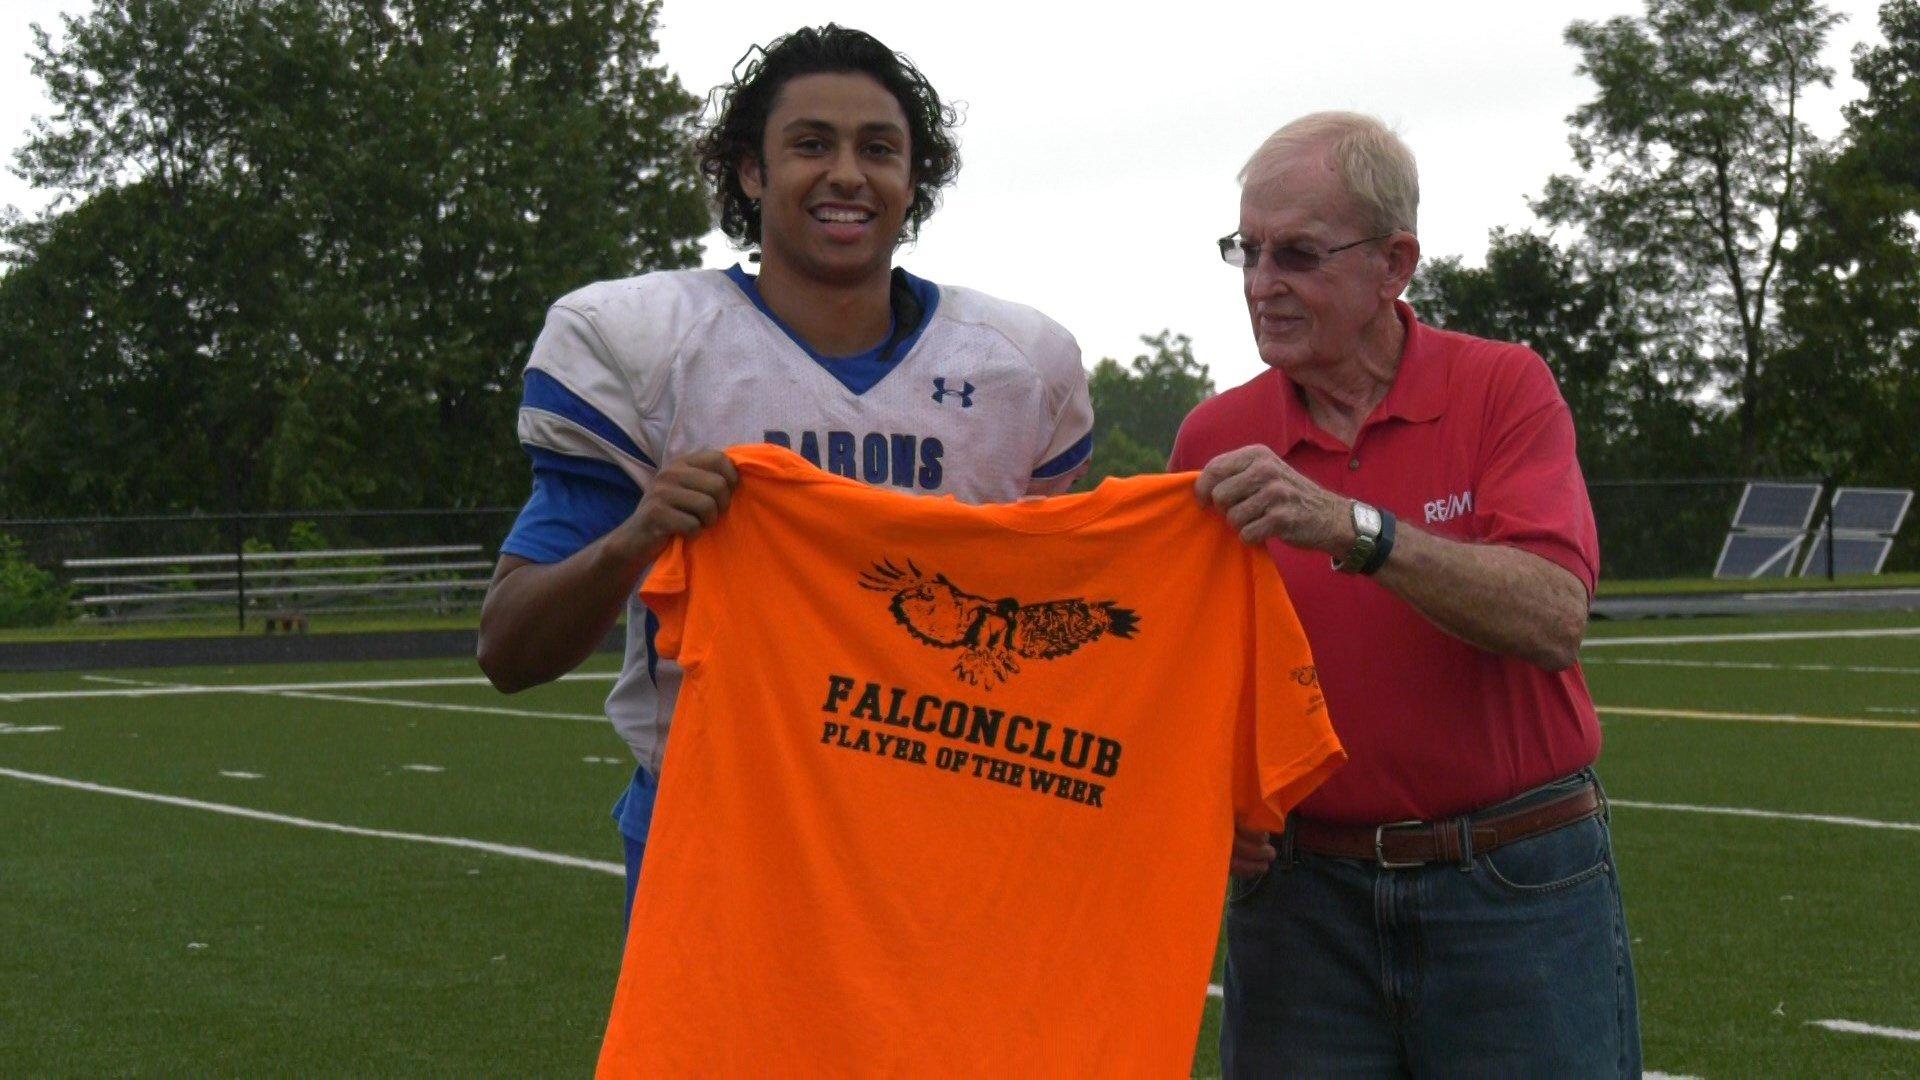 Blue Ridge School'sXavier Kane wins Falcon Club Player of The Week.